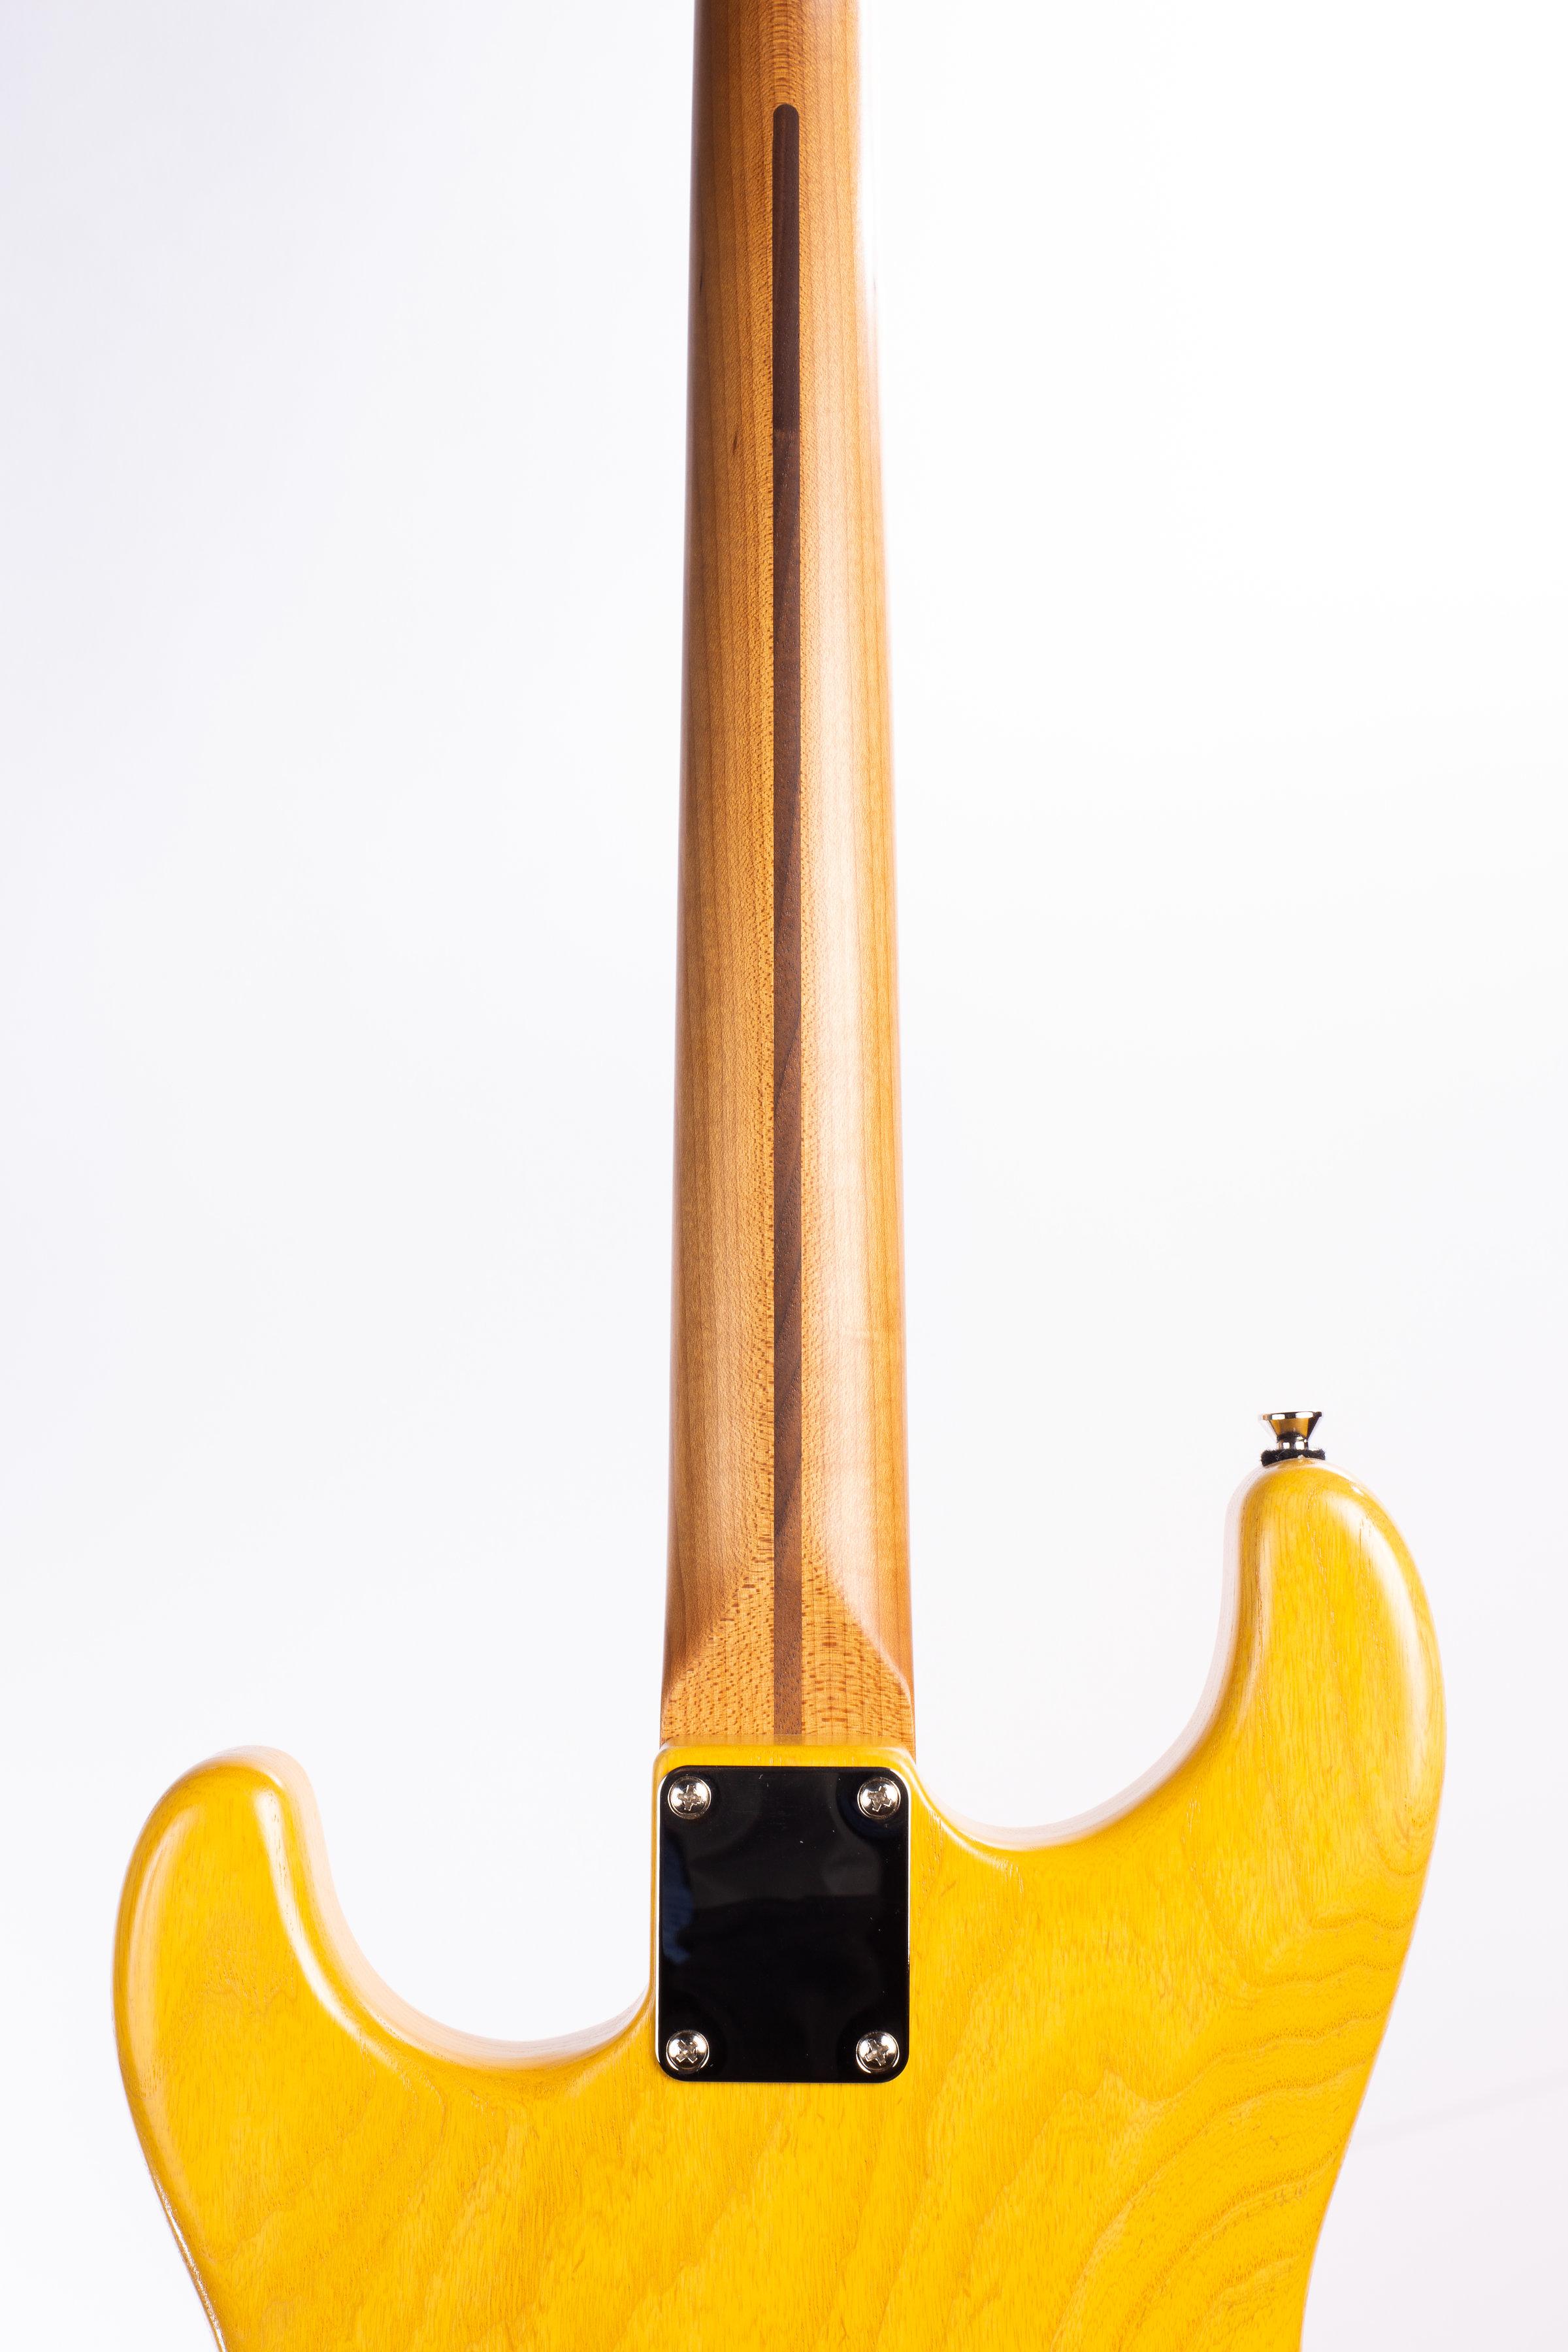 YellowStrat-5.jpg